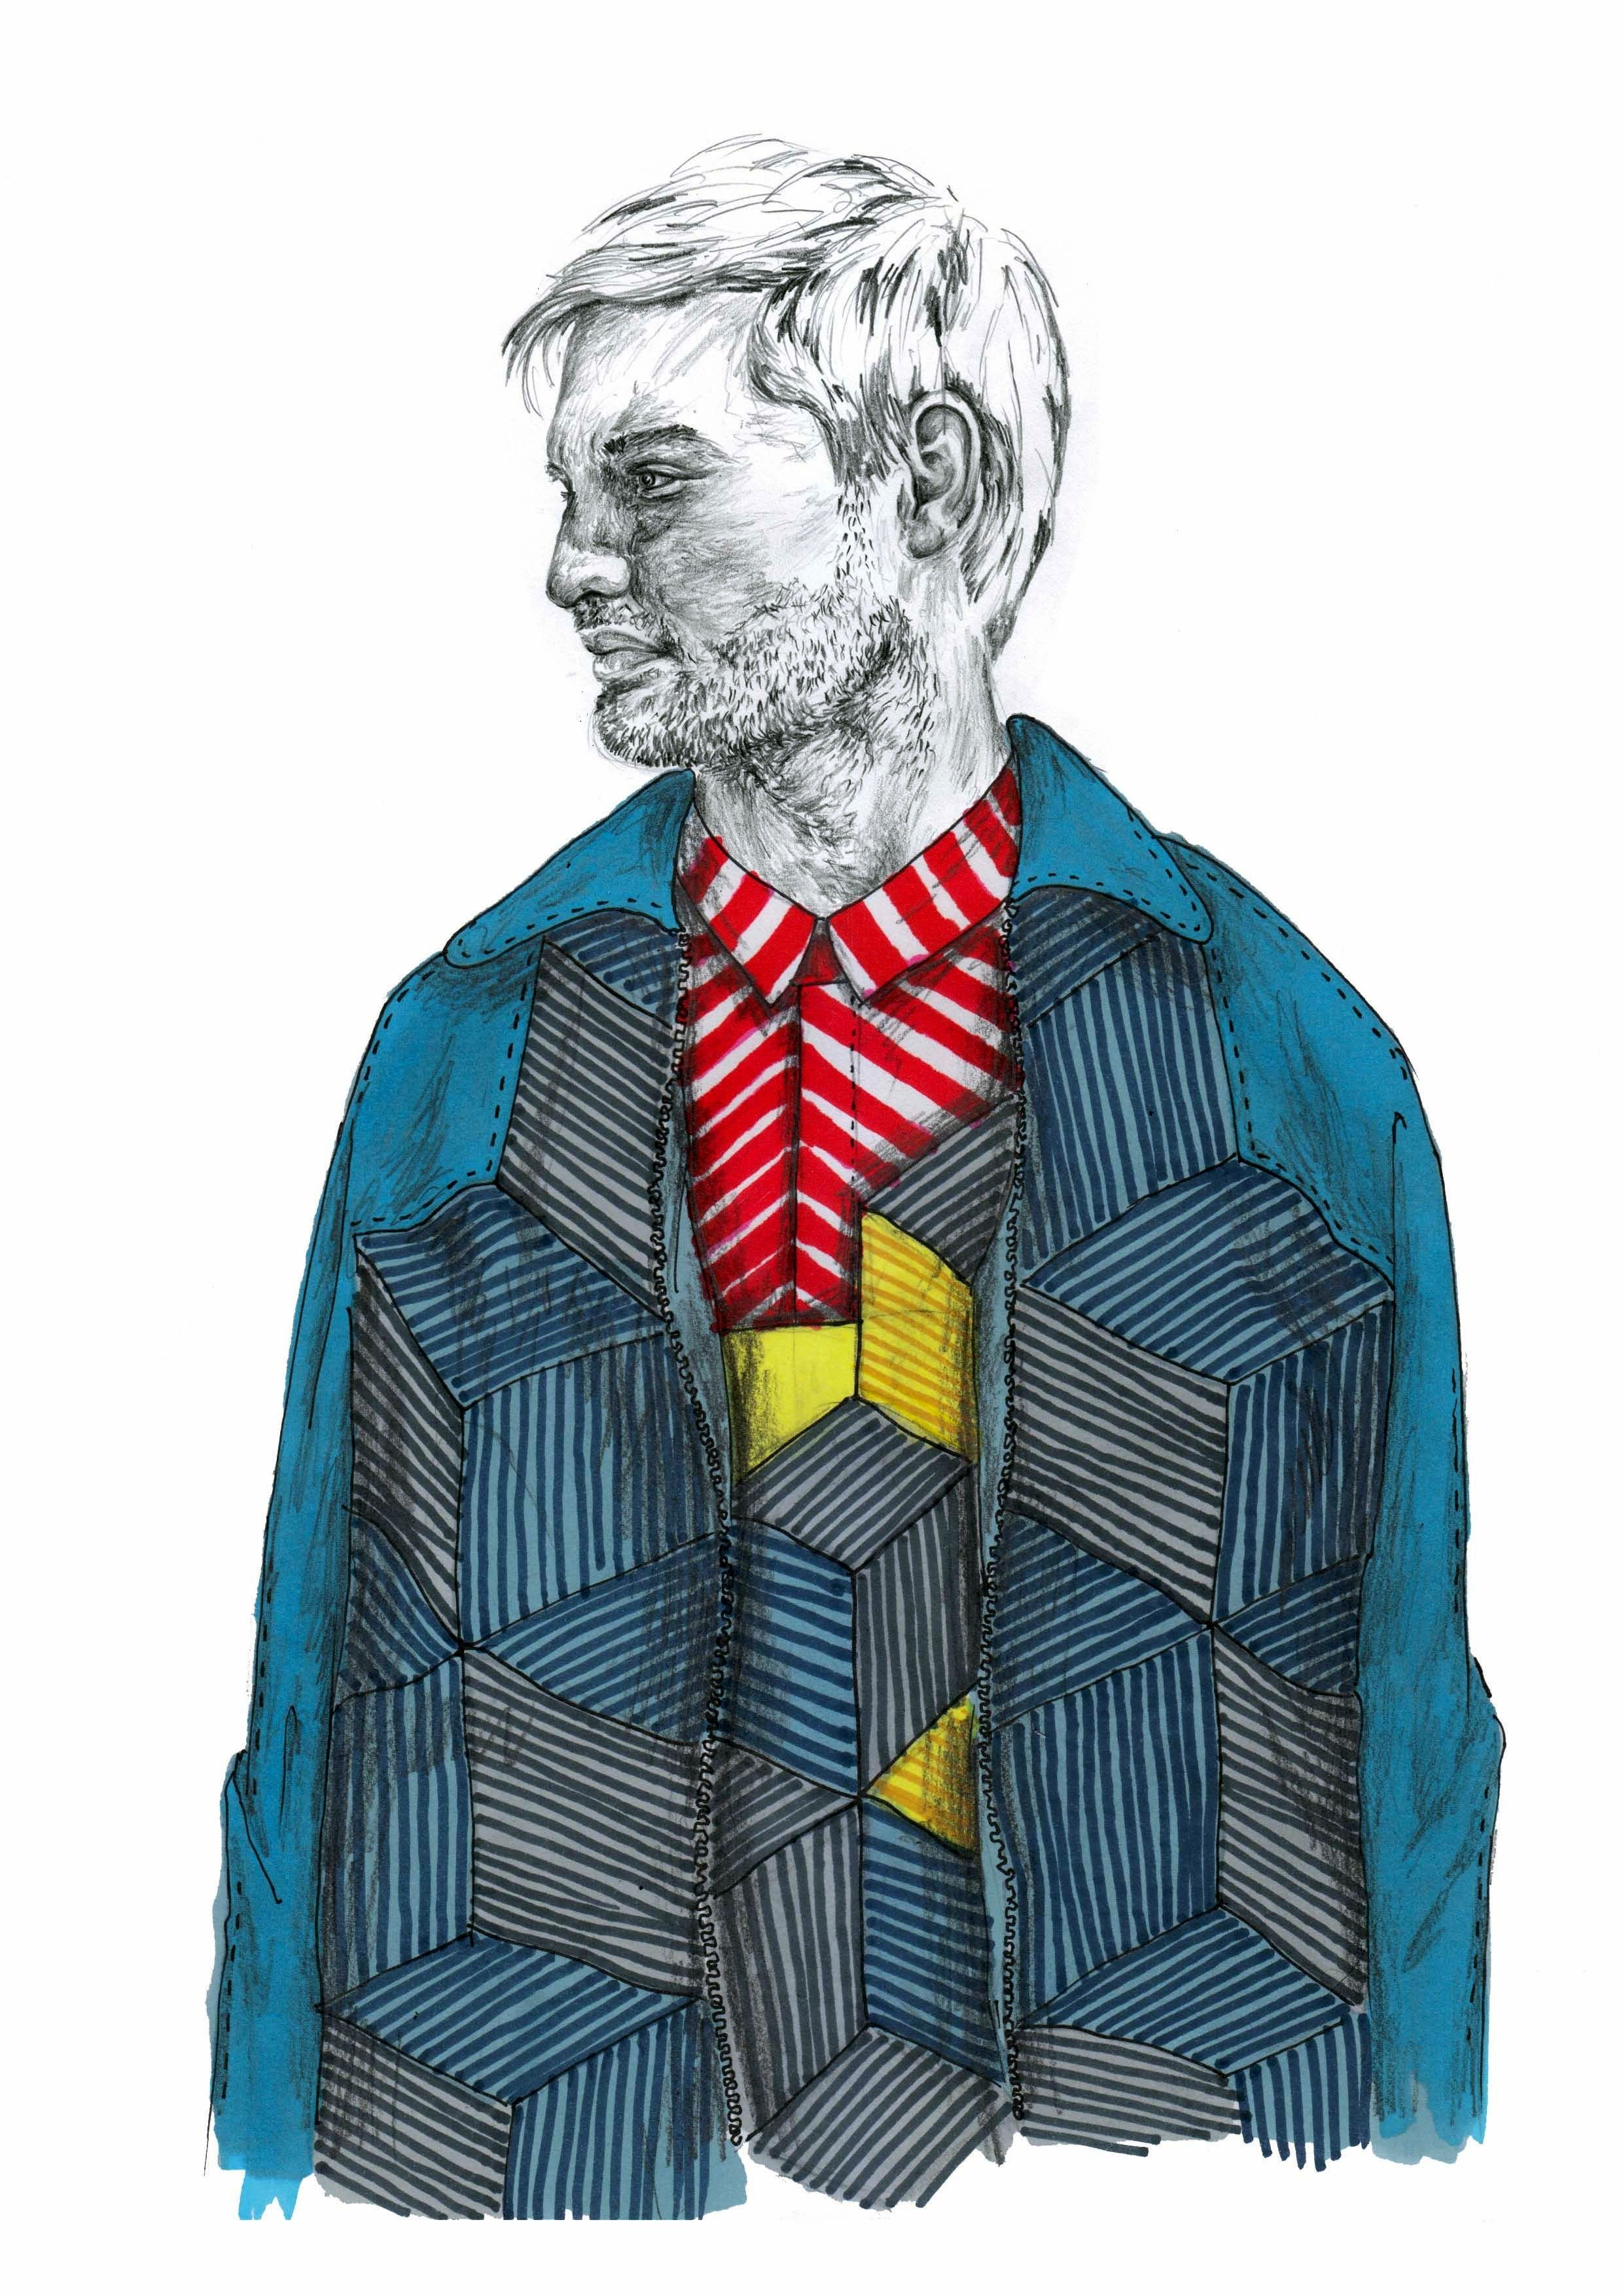 2480x3508 Westminster Fashion Illustration Charlotte Scott Draw